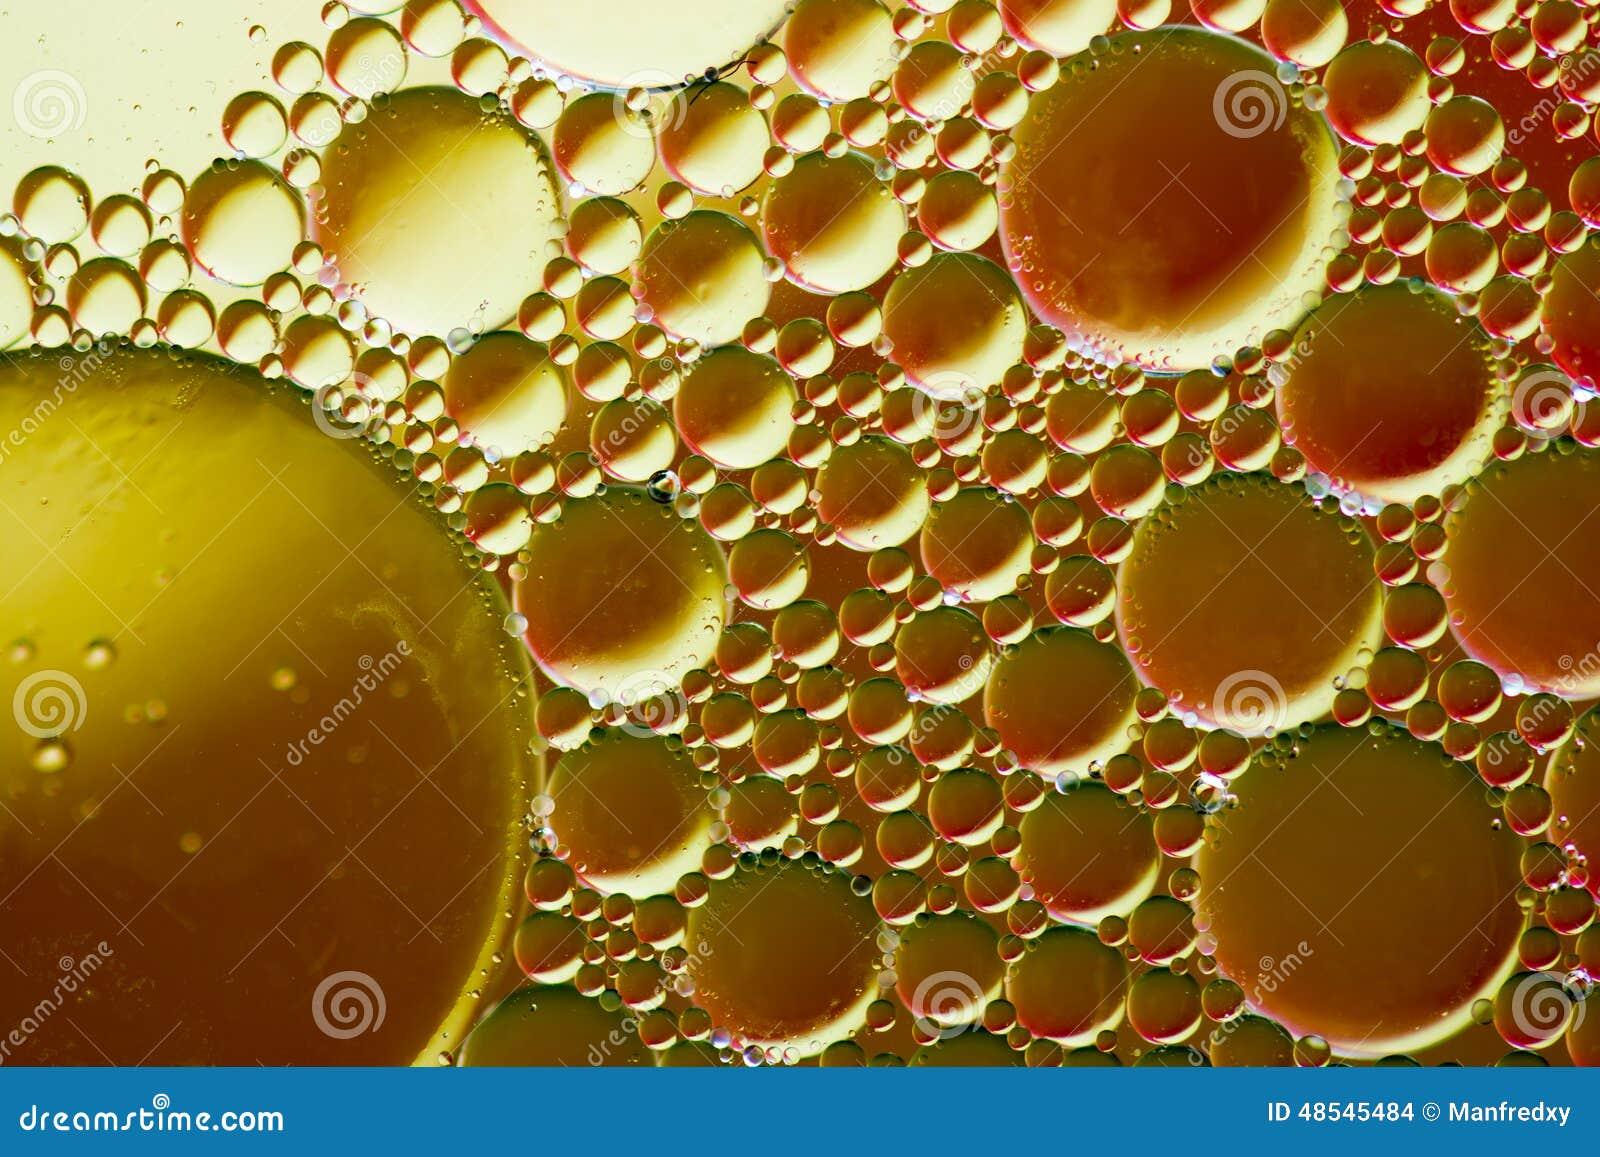 Oil Bubble Background